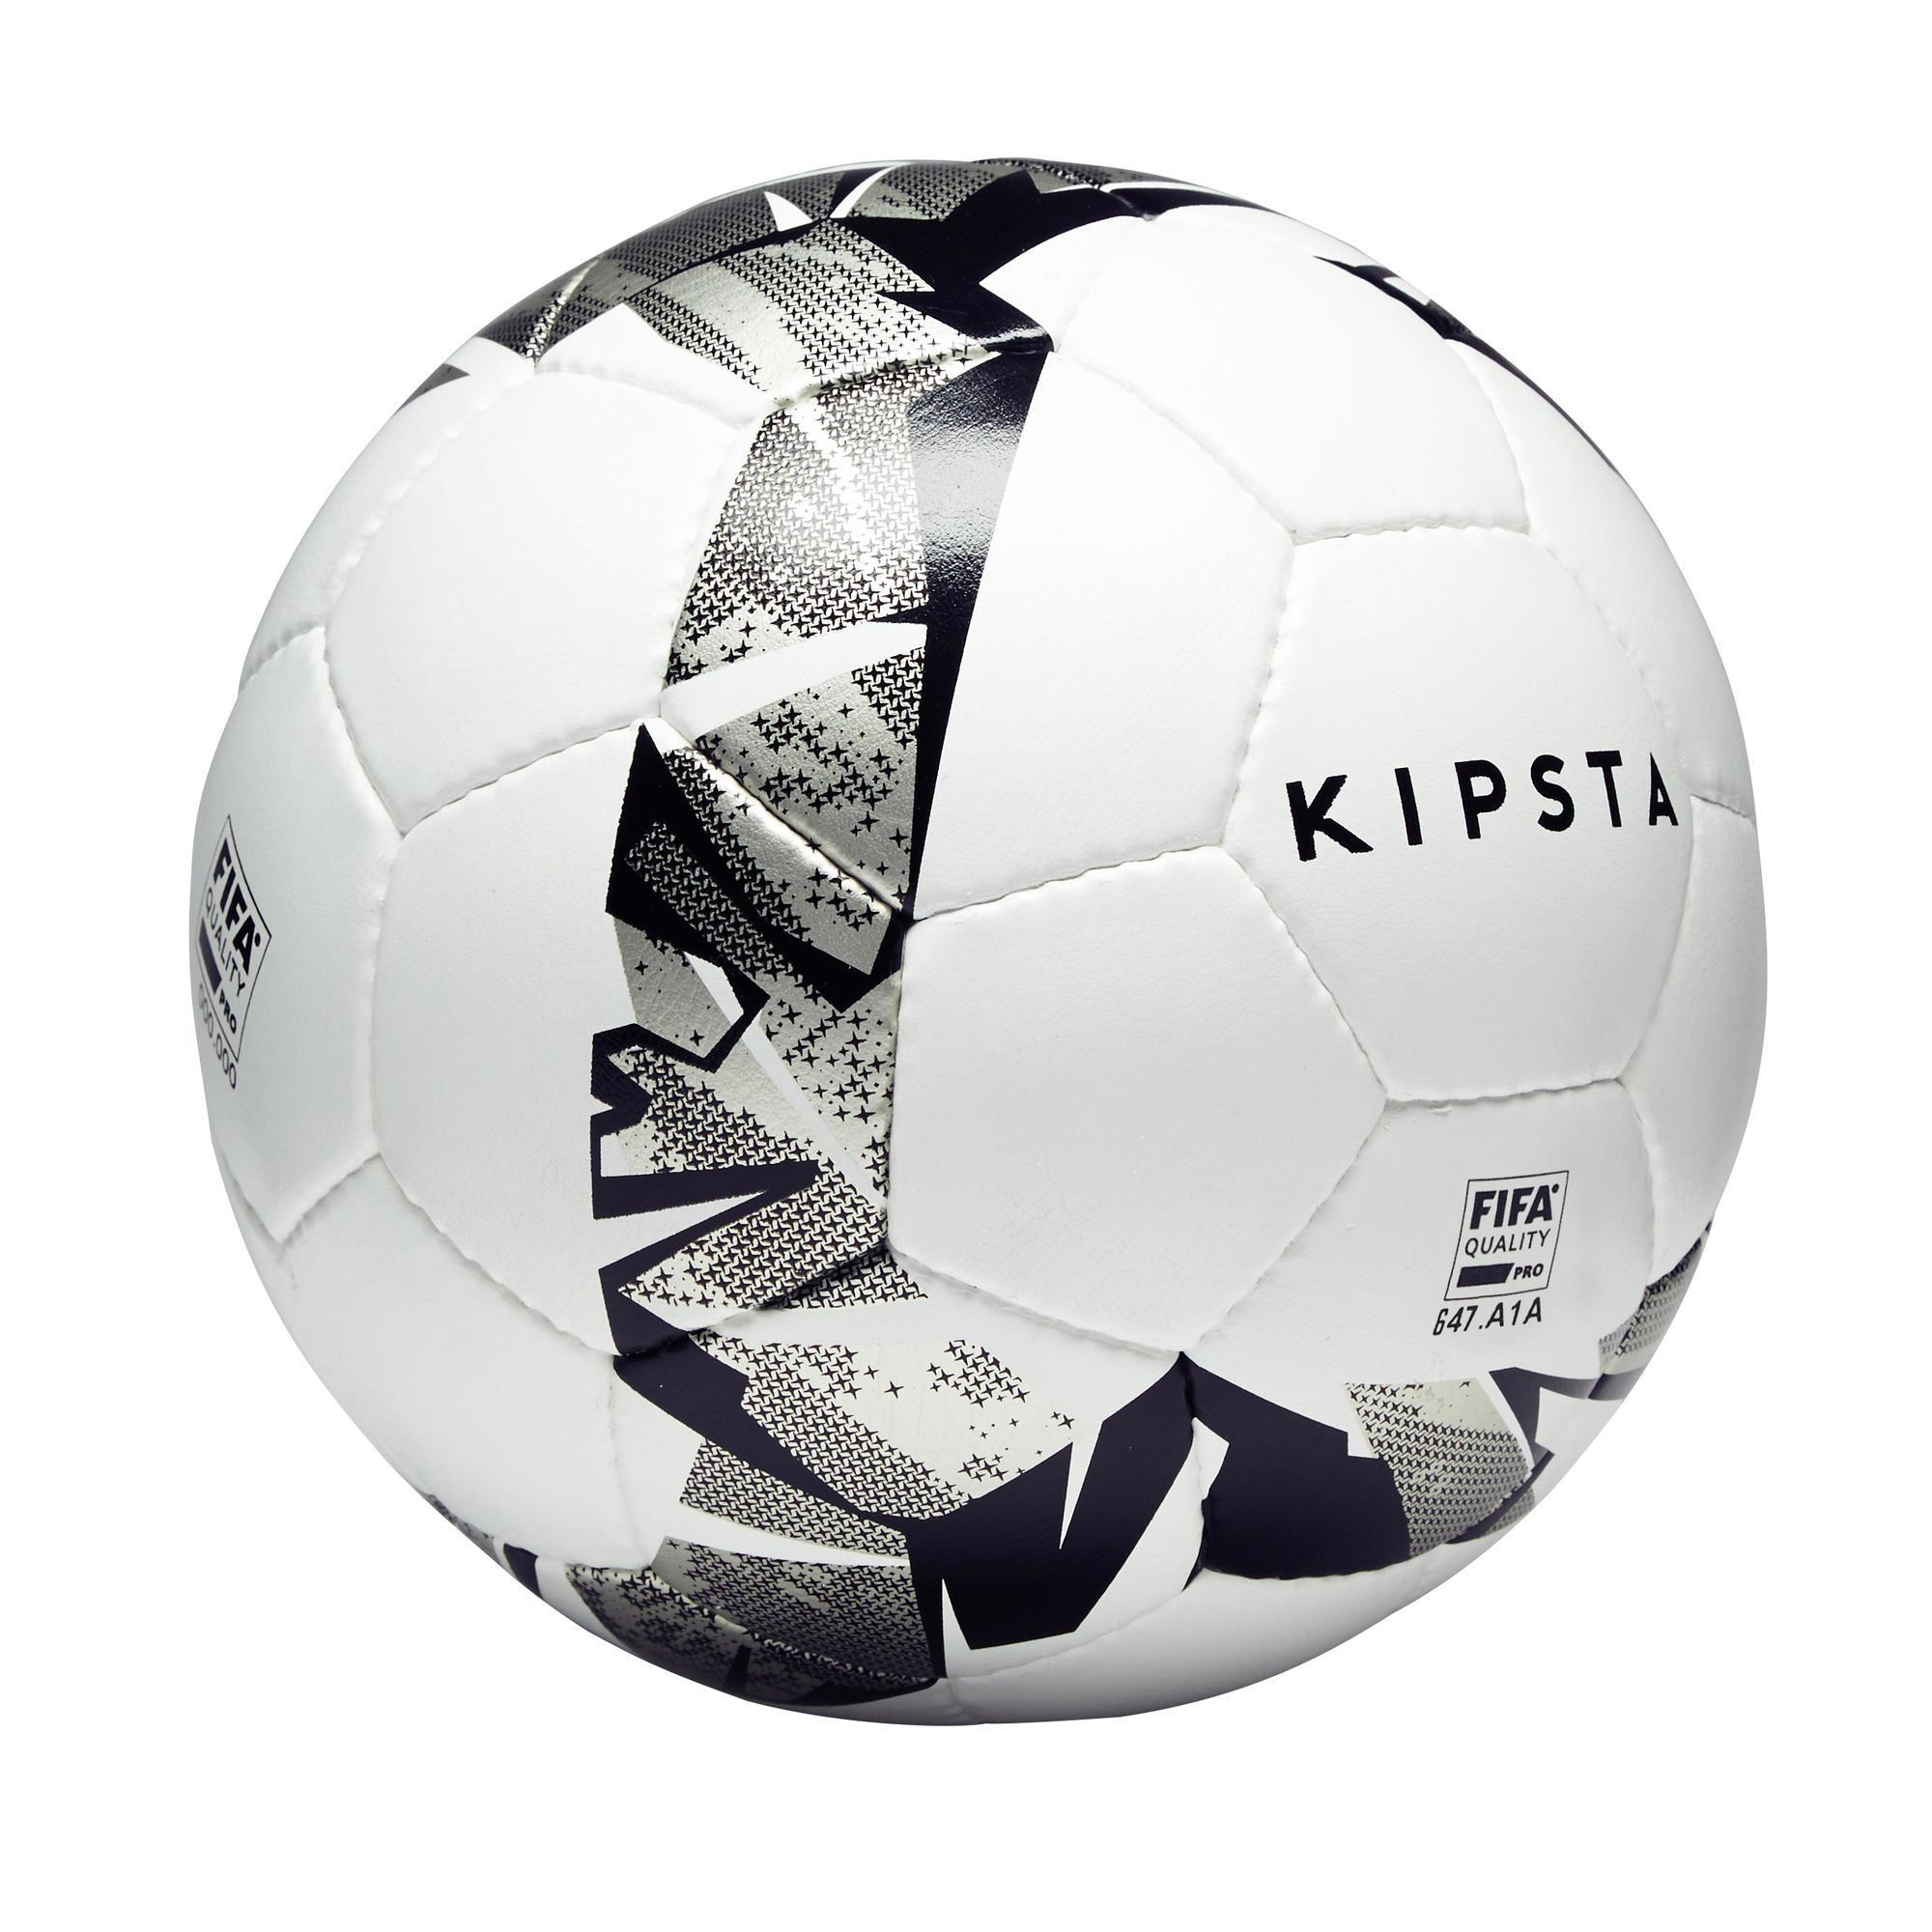 be0c6345413aa Comprar Balones de Fútbol Sala online